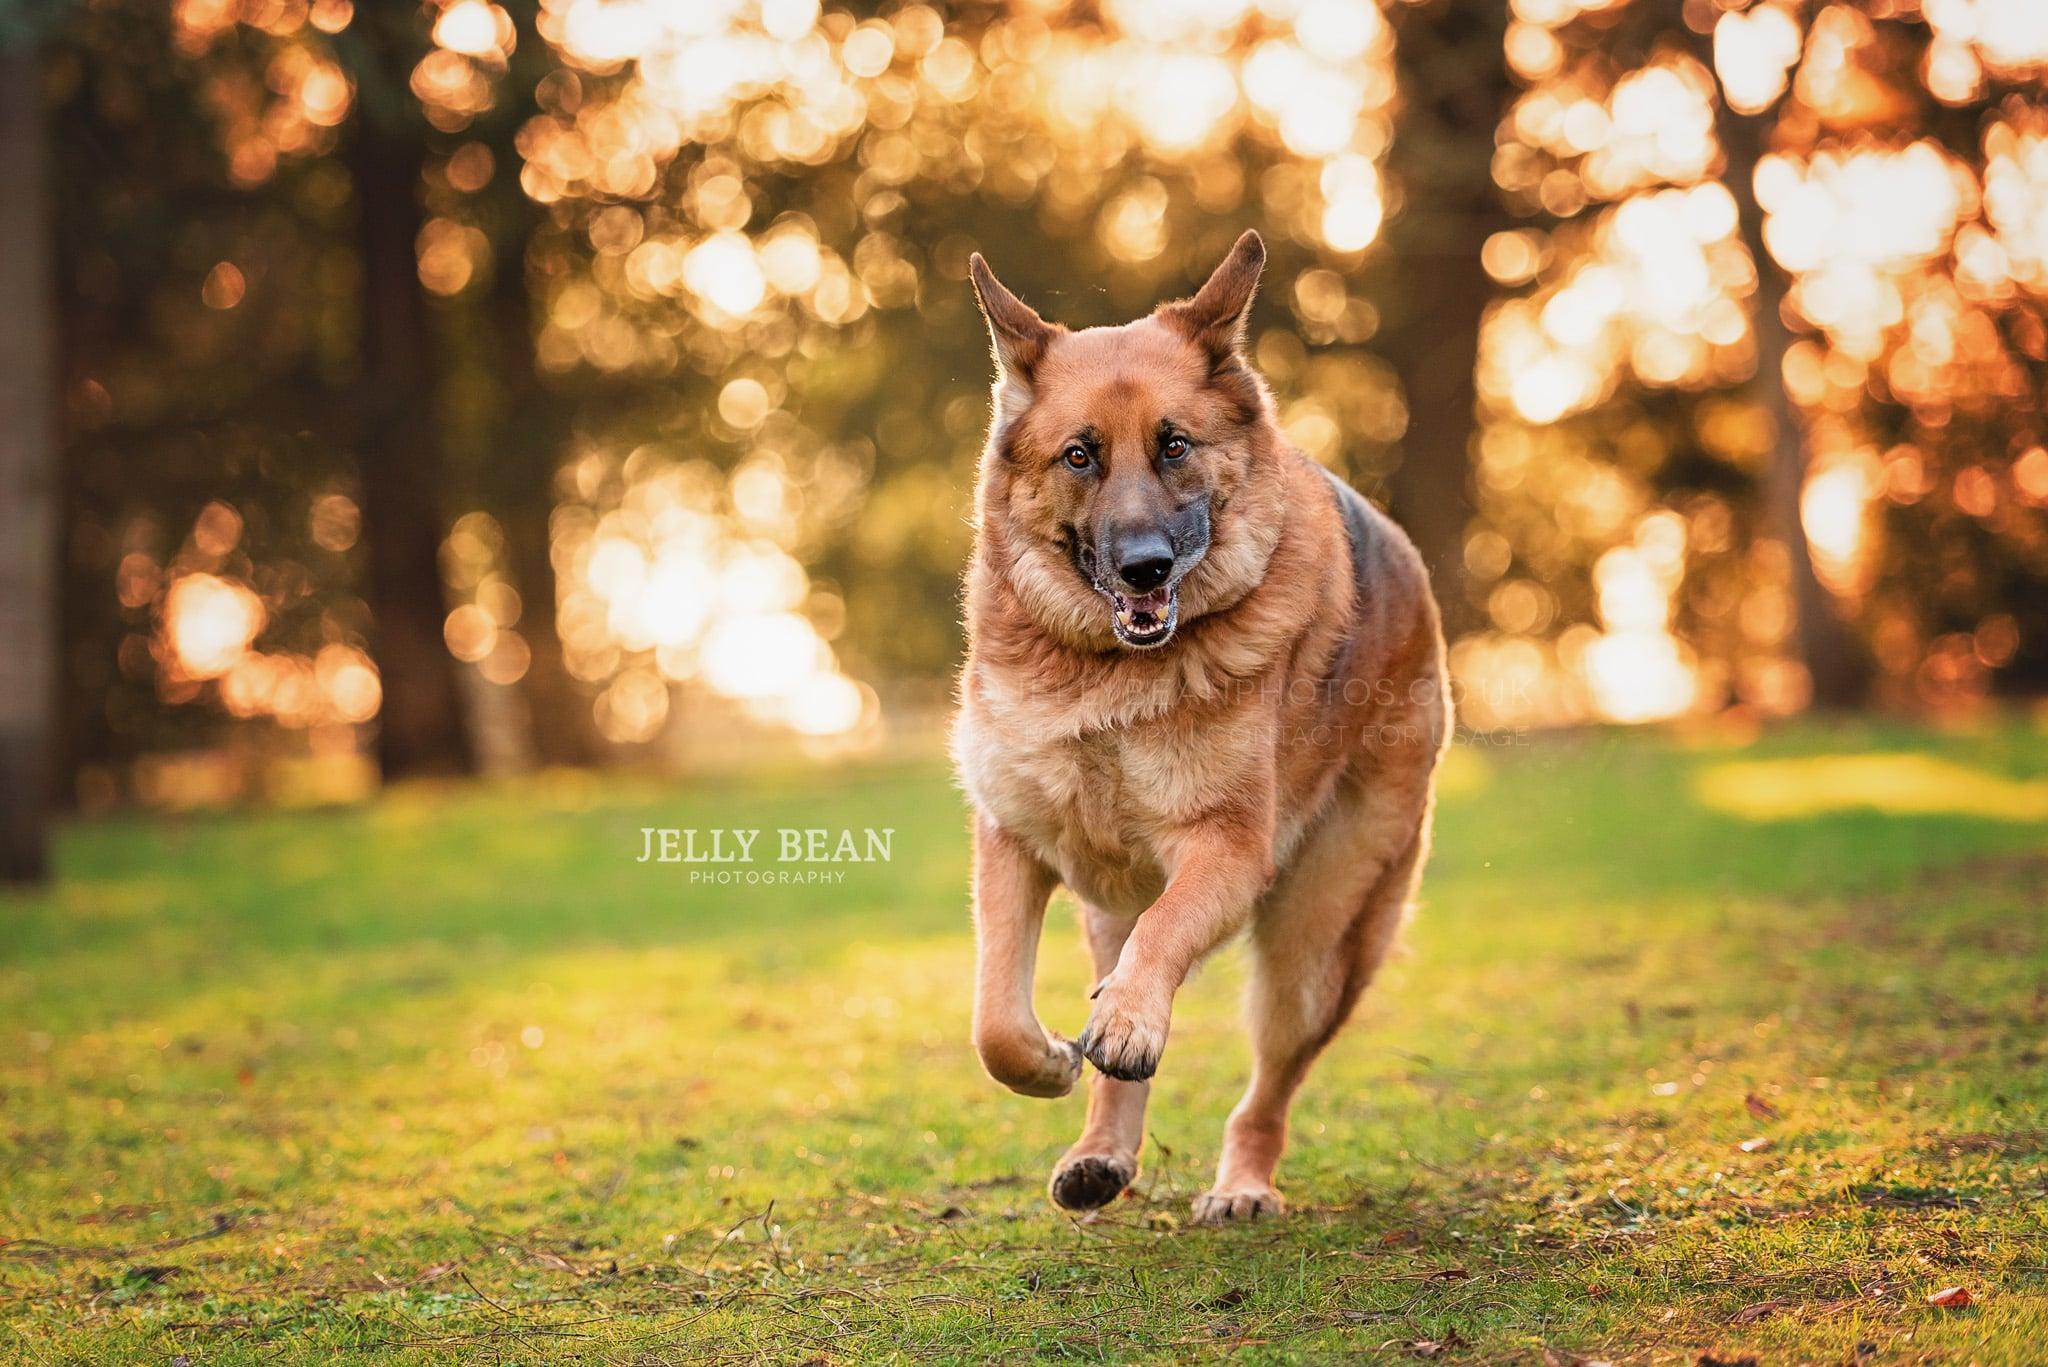 German shepherd dog running pulling funny face